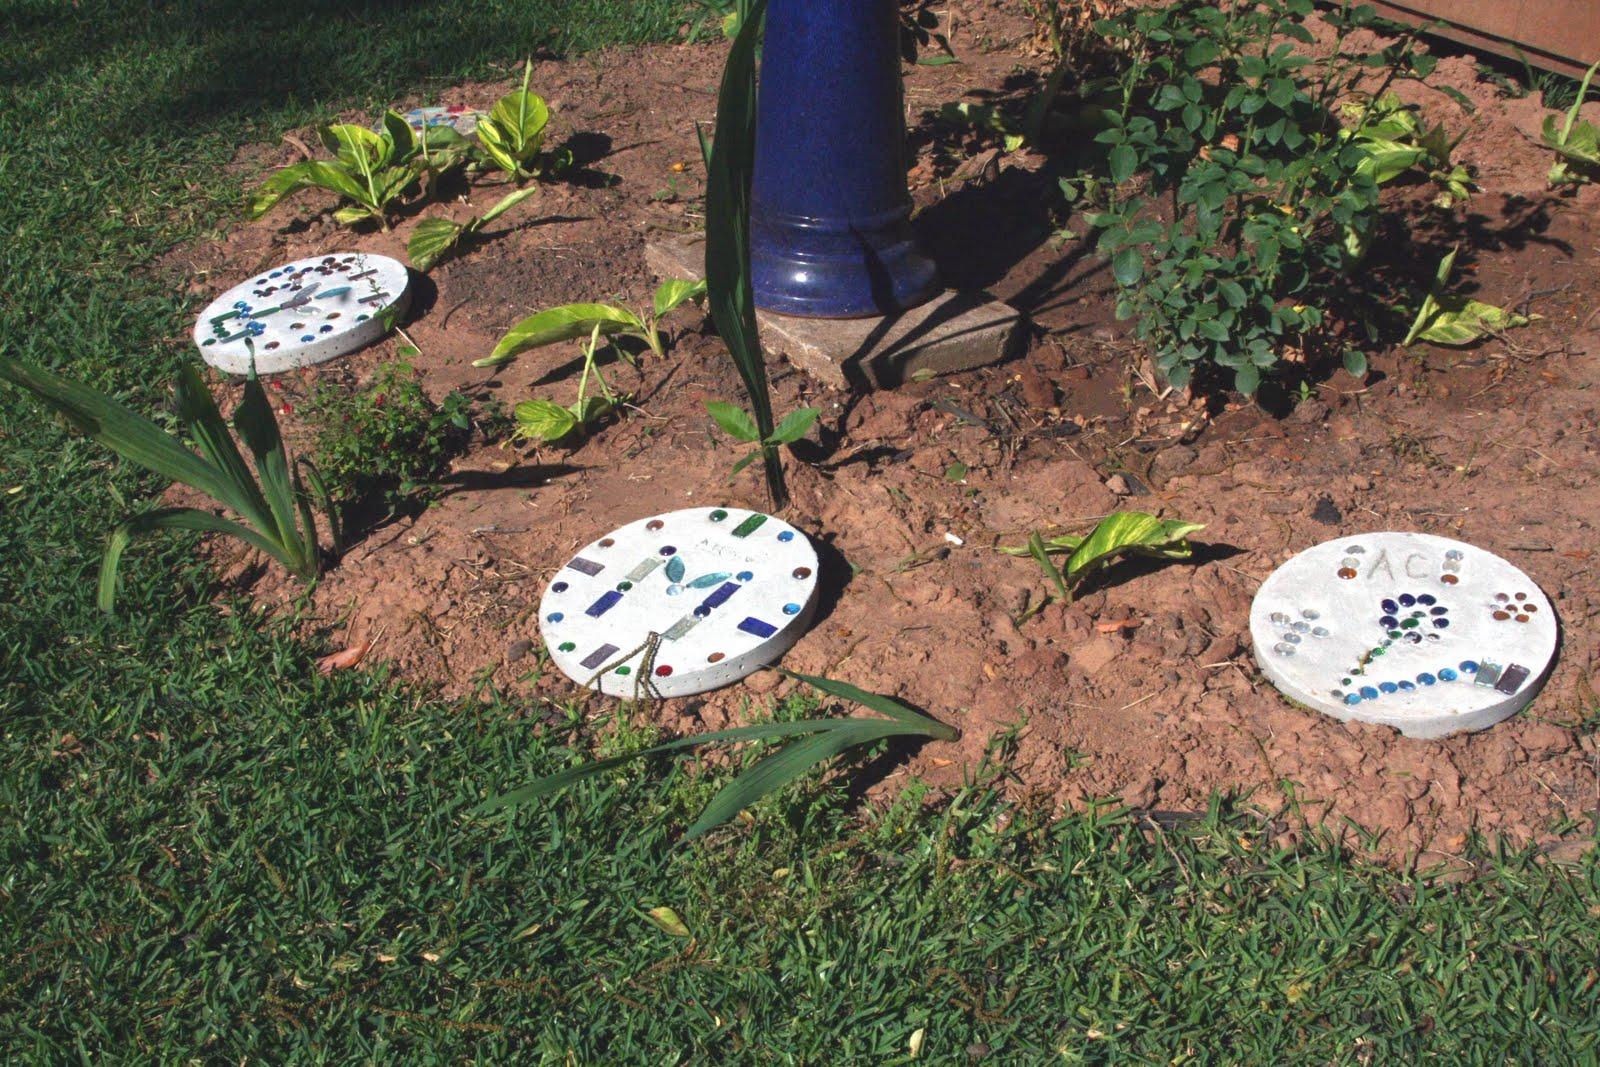 The Creamer Chronicles: Memorial stones for the garden